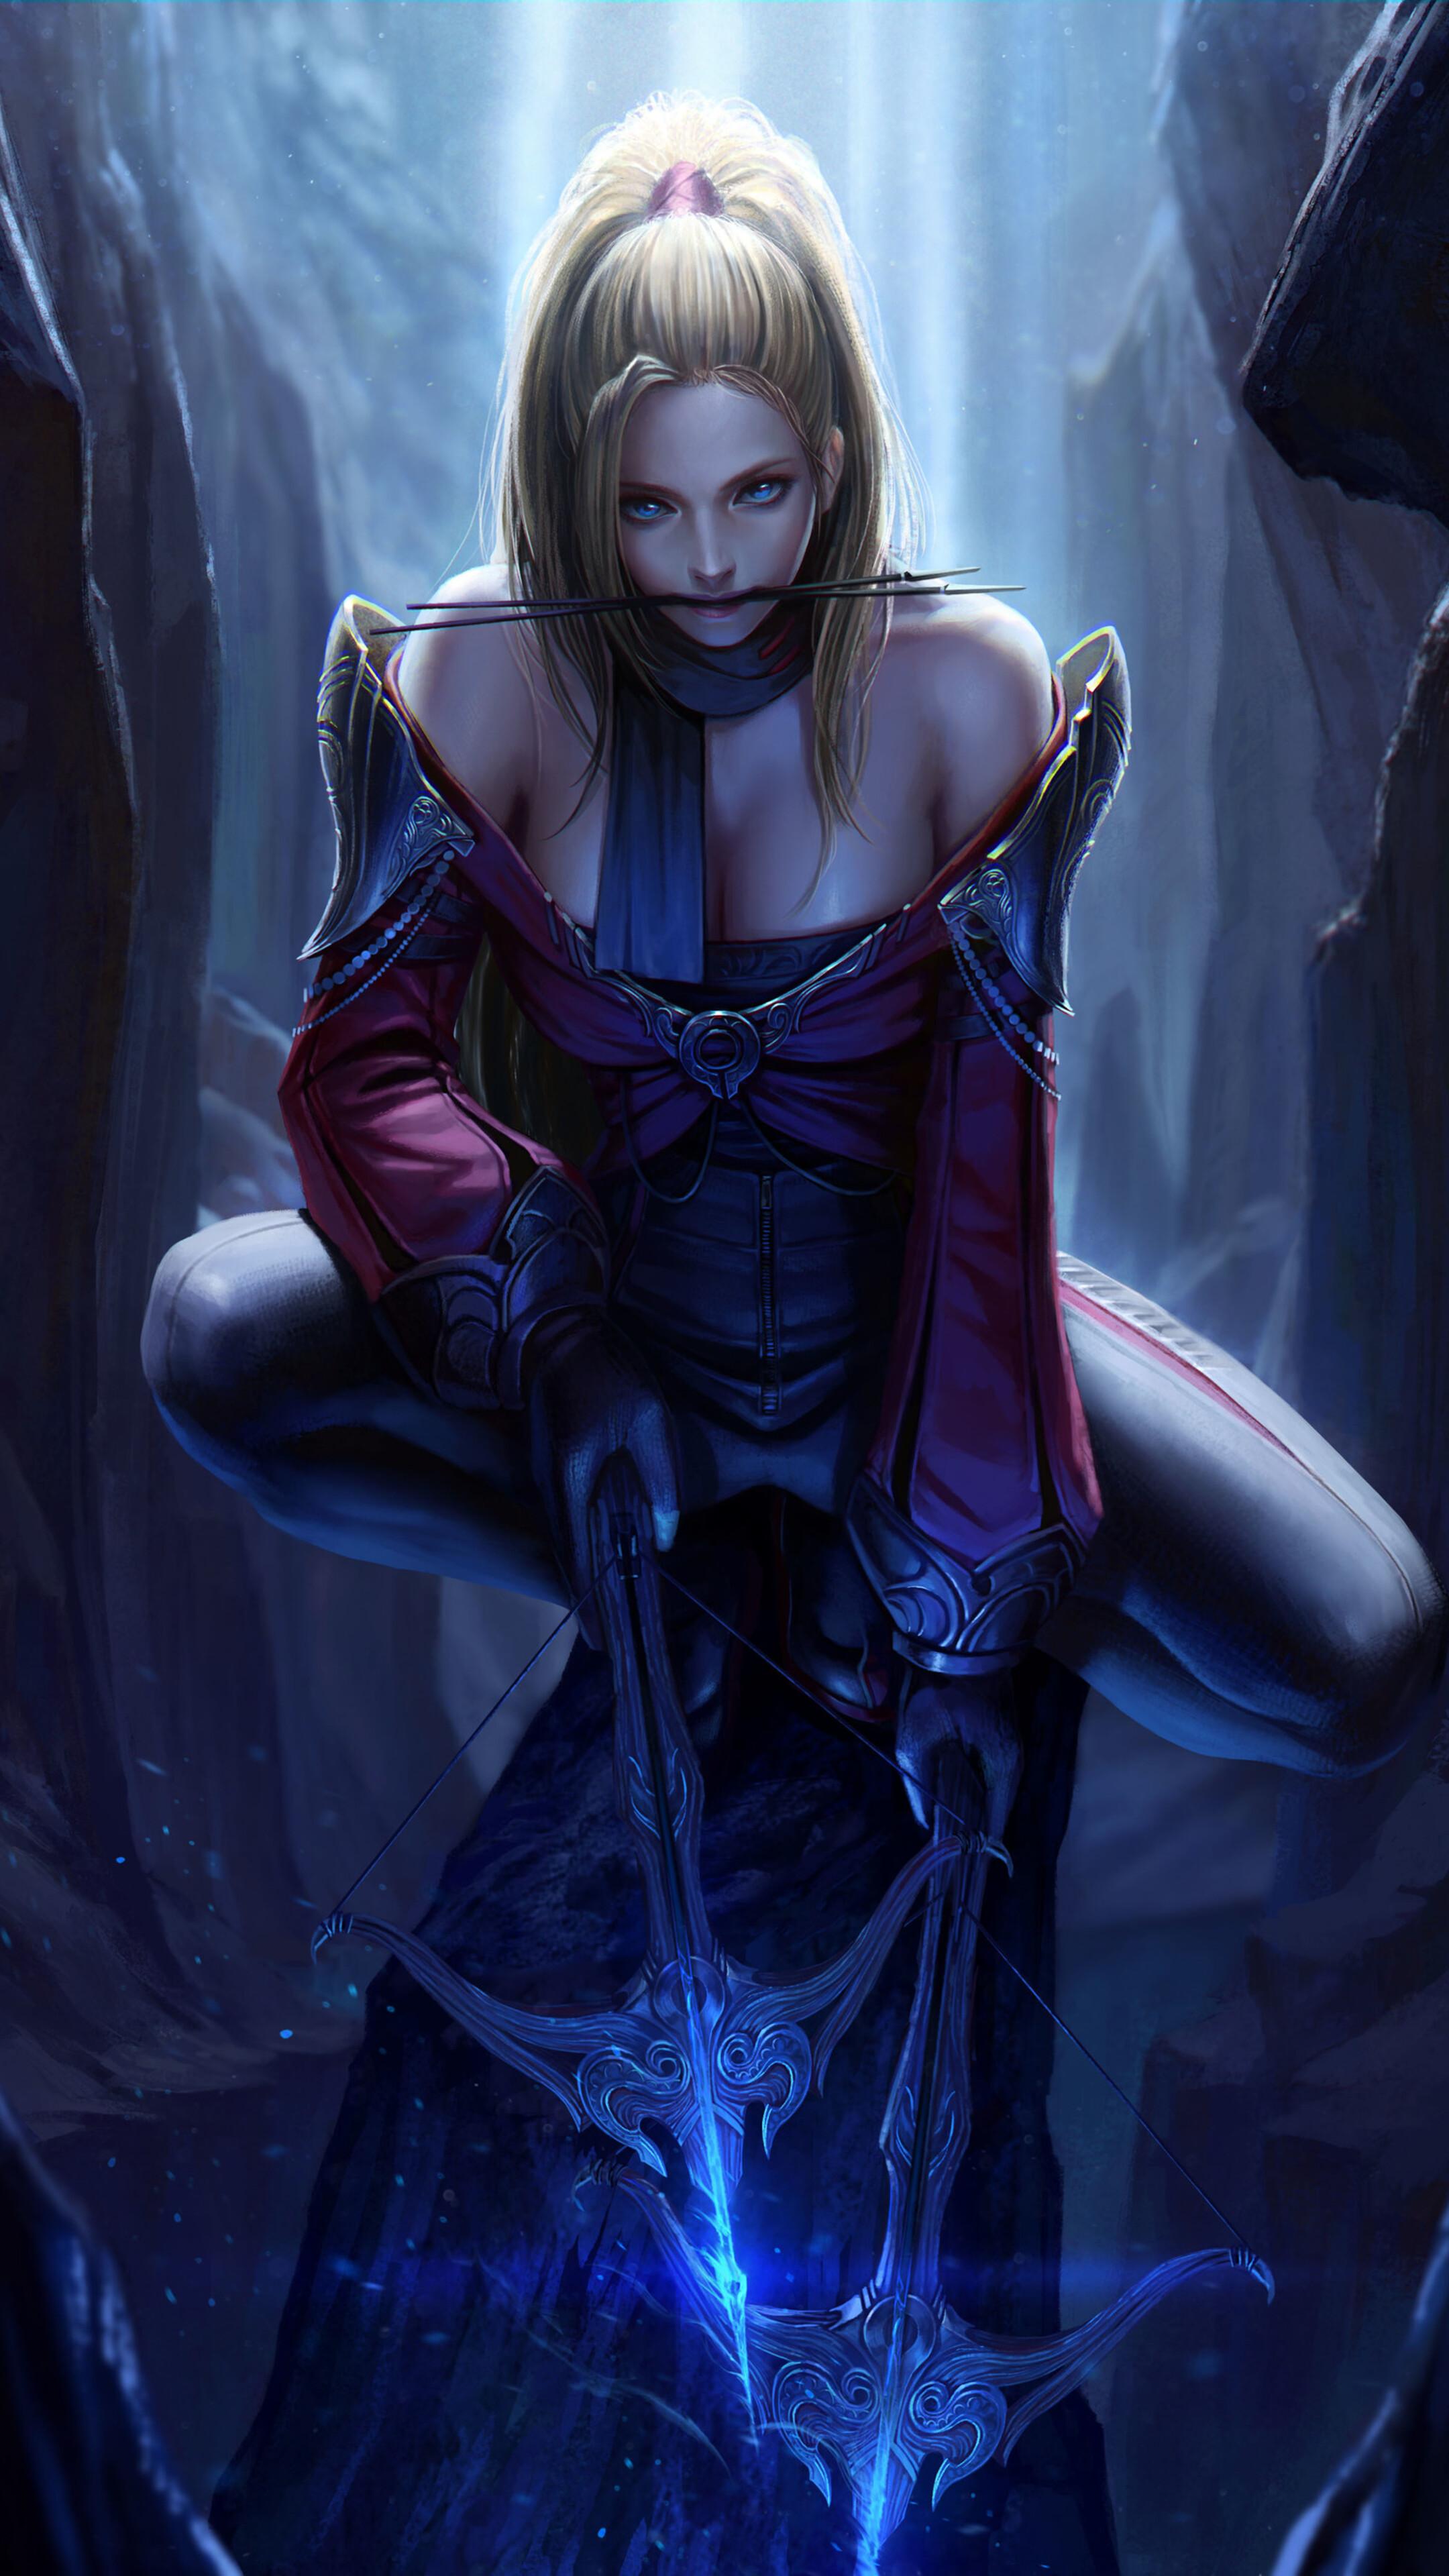 2160x3840 fantasy girl with archer crossbow sony xperia x - Art wallpaper 2160x3840 ...